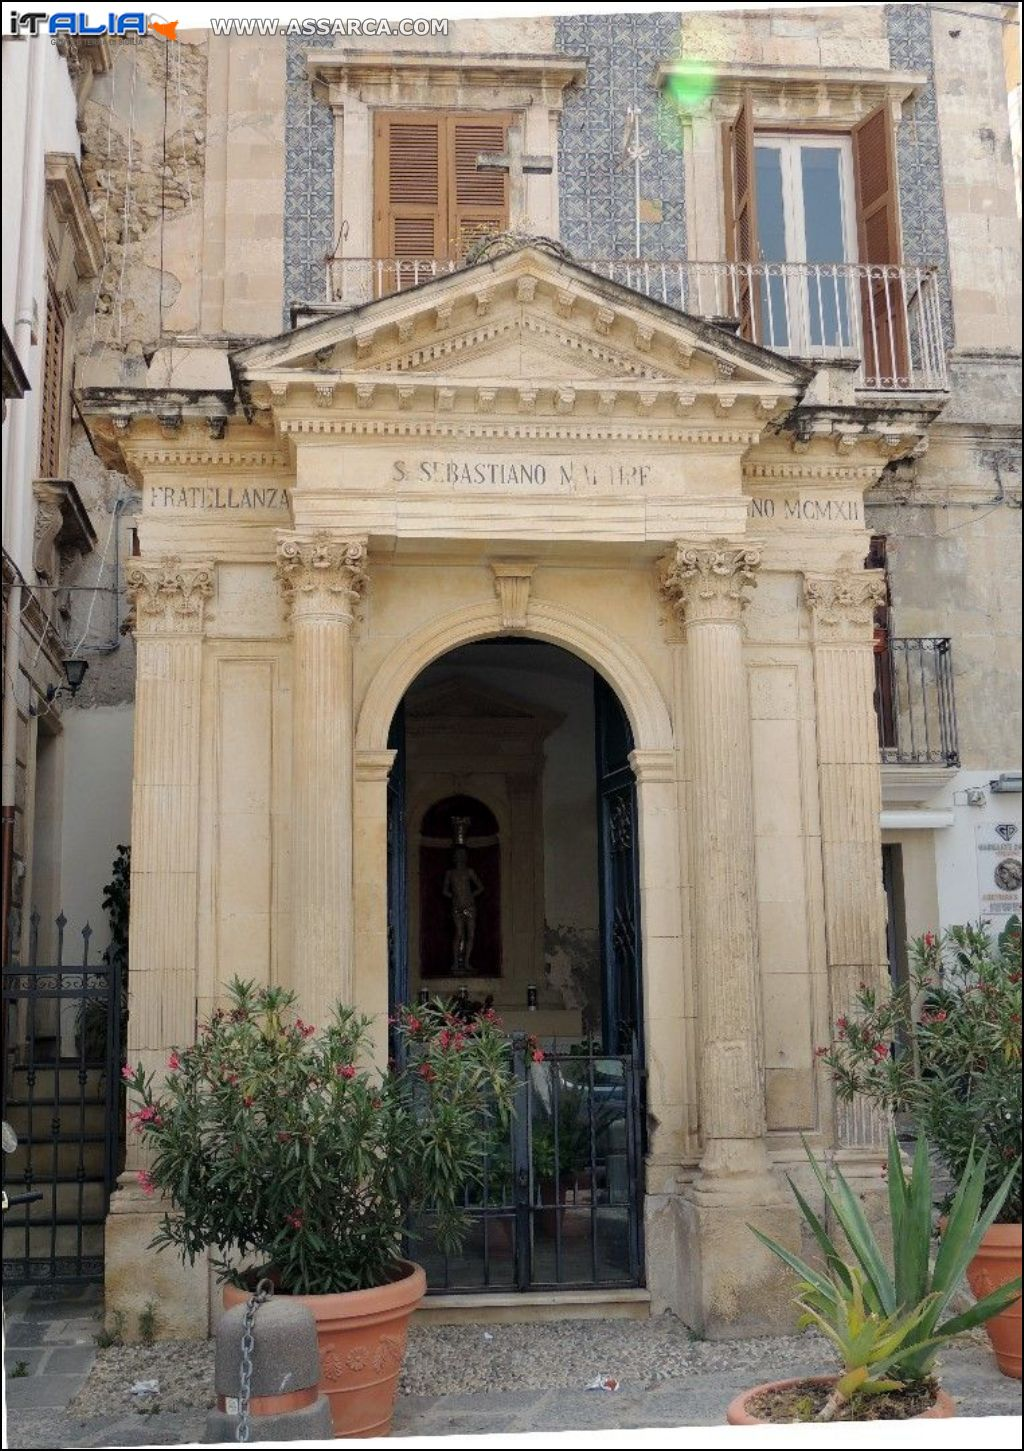 Siracusa - Cappella S.Sebastiano - MCMVII*